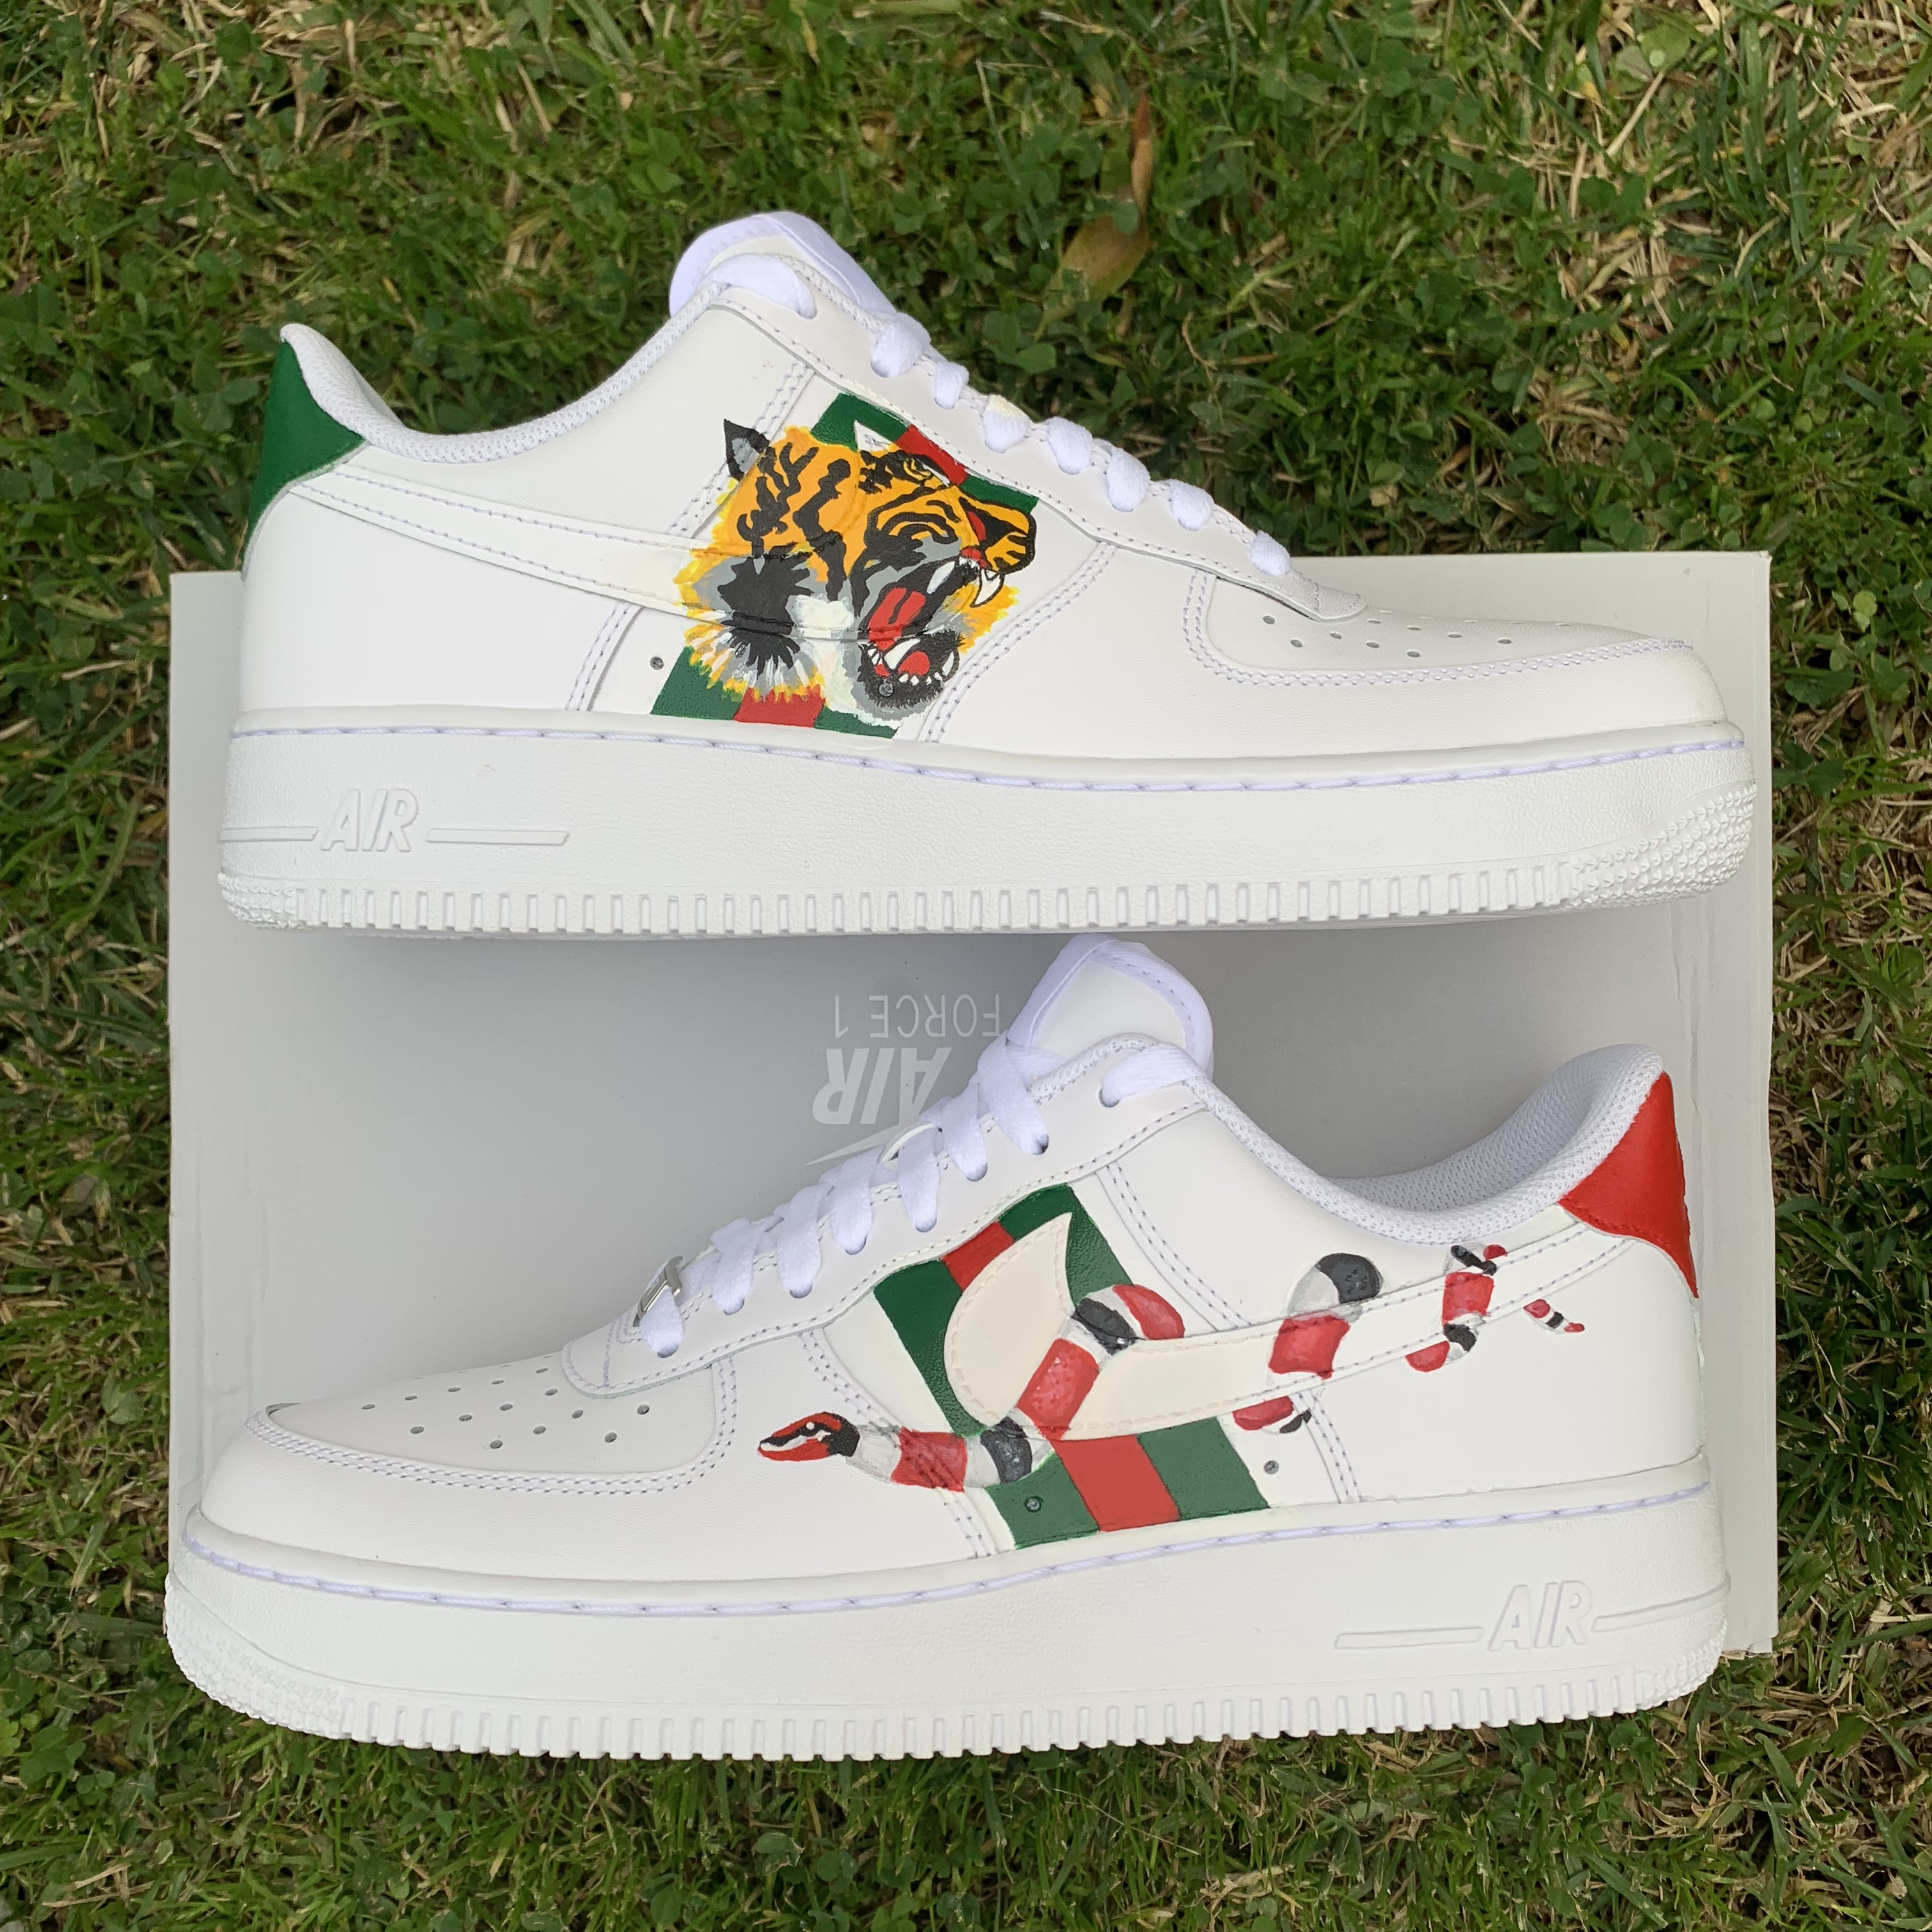 Gucci Nike Air Force 1 The Custom Movement